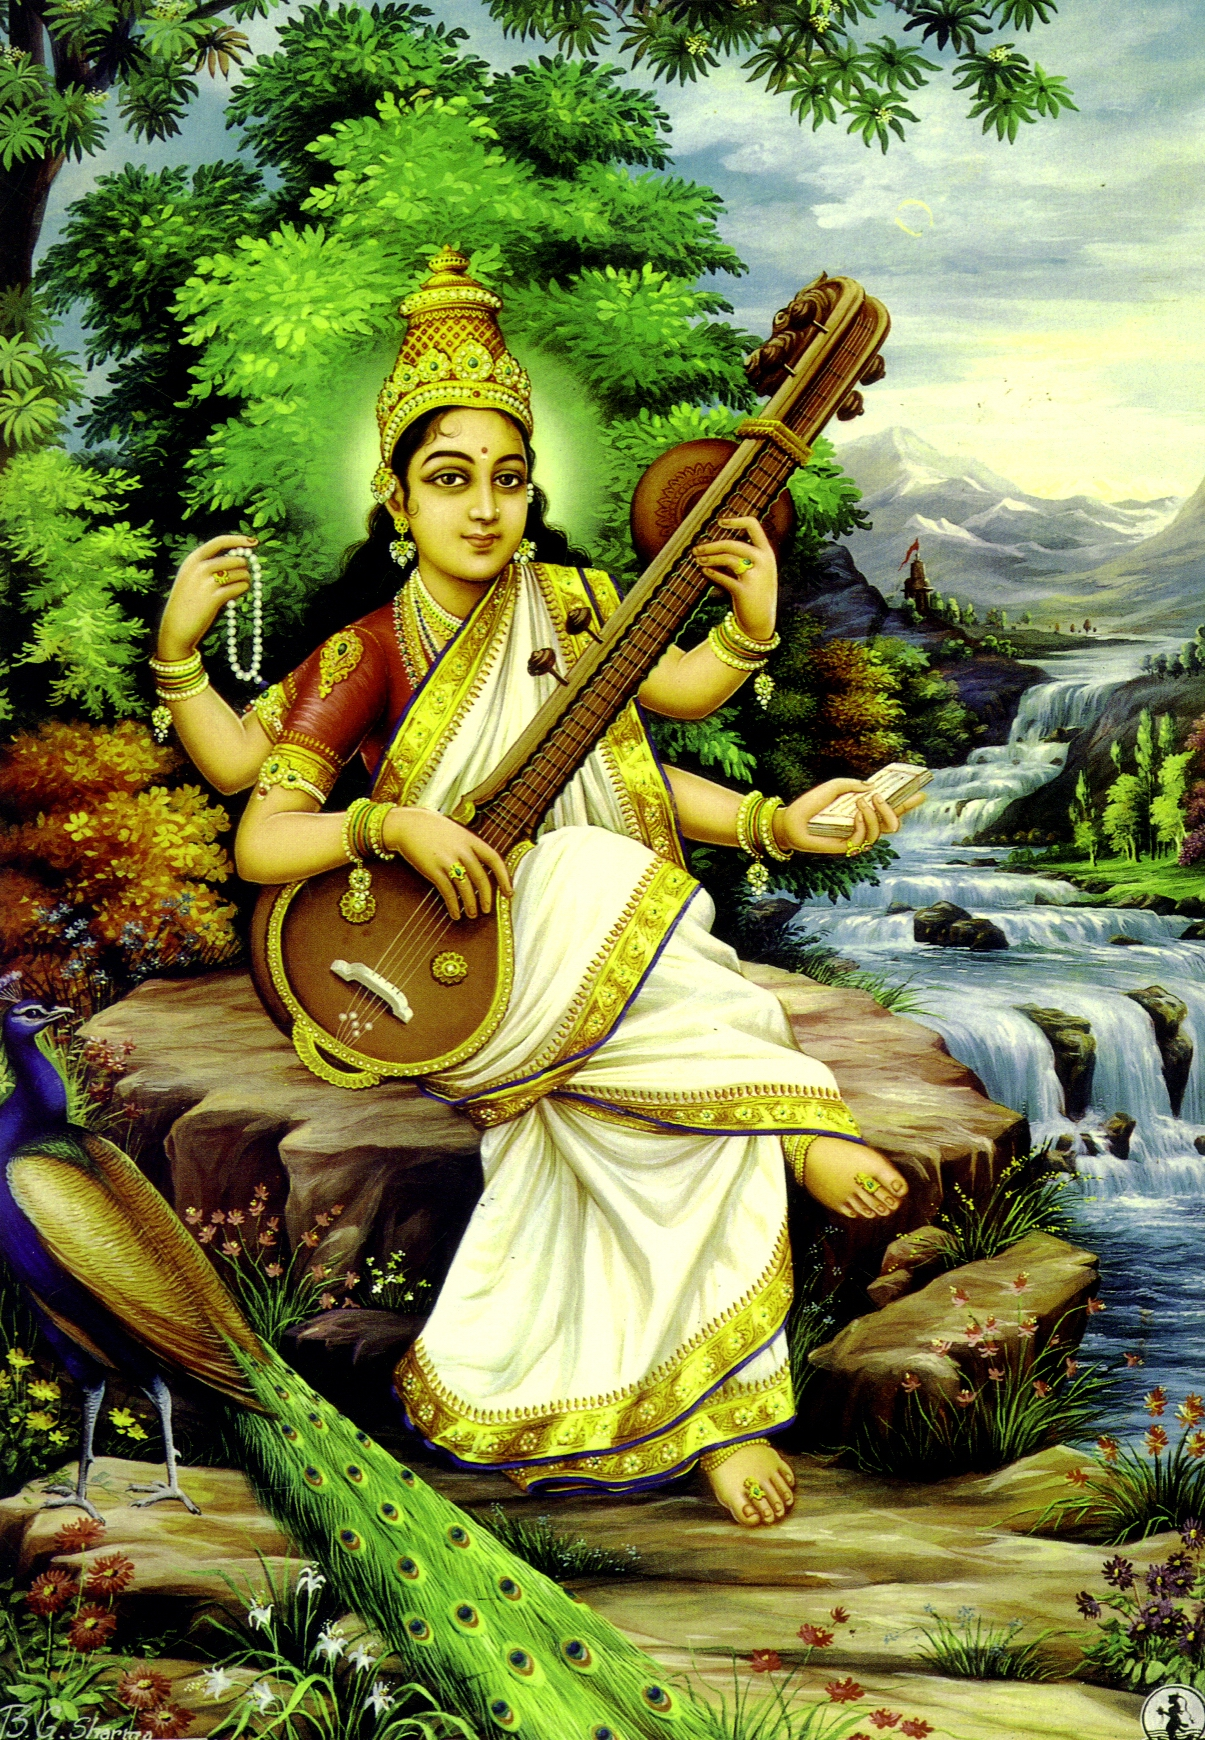 Sarasvati the Goddess of Learning